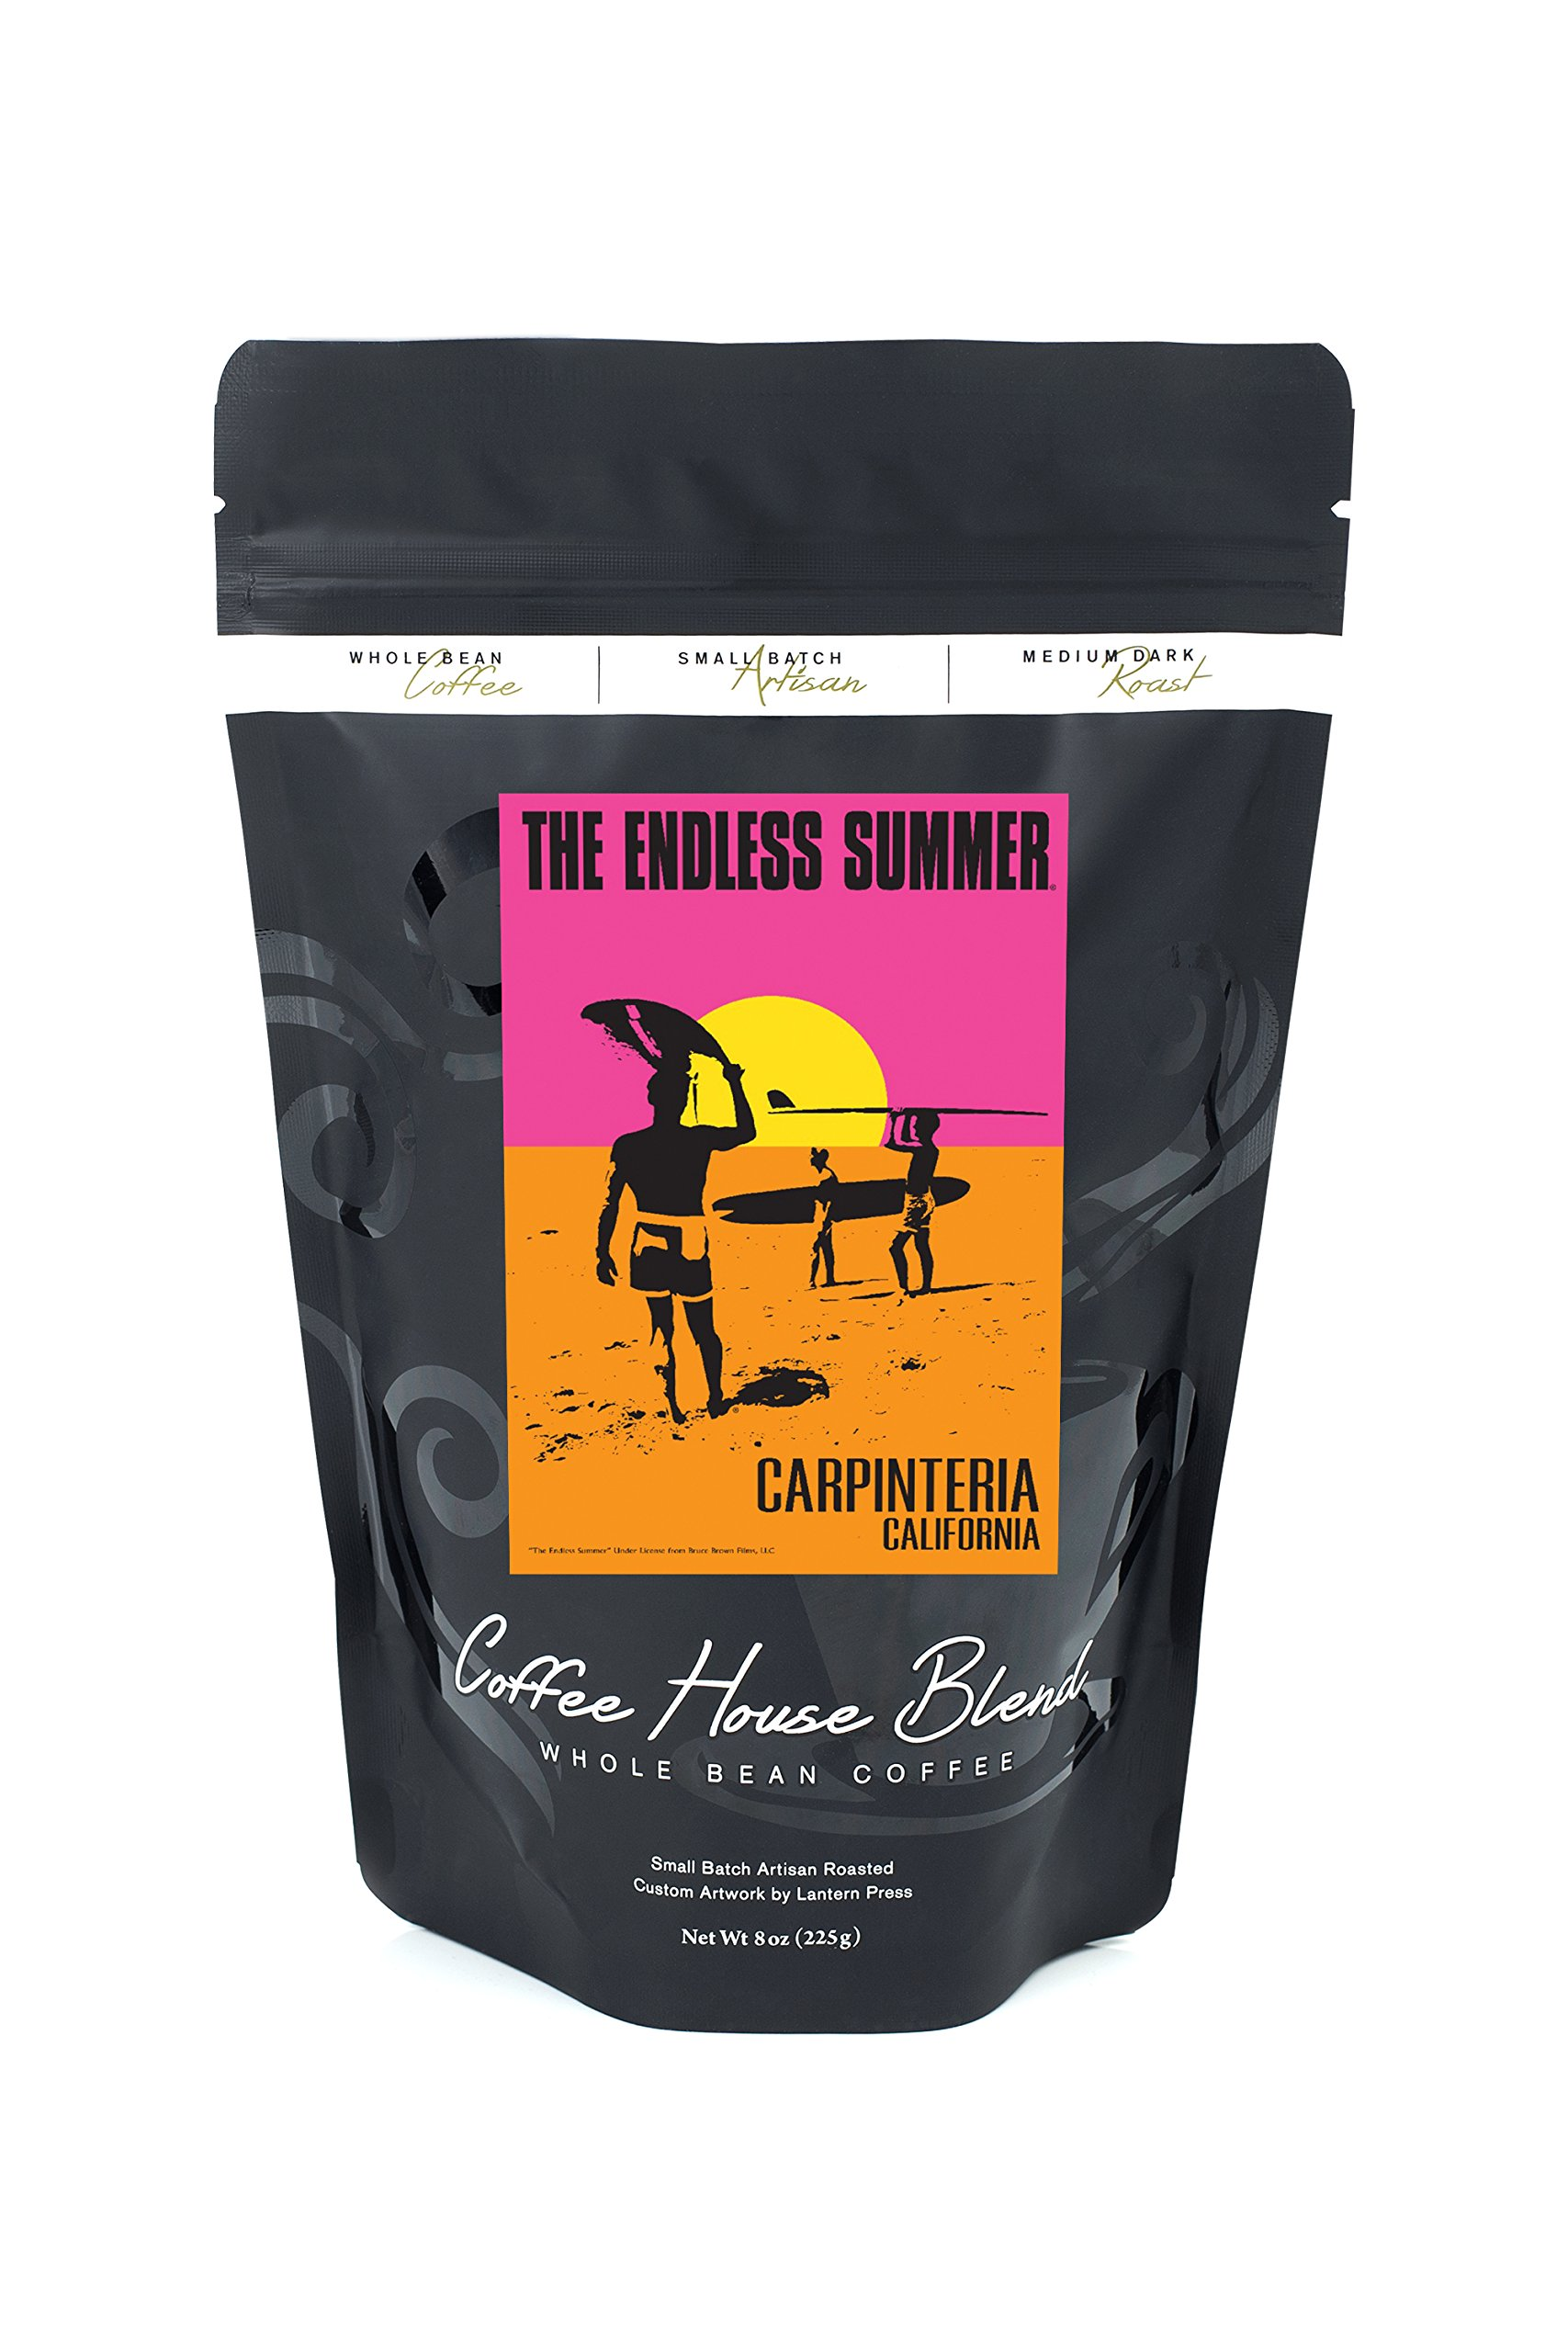 Carpinteria, California - The Endless Summer - Original Movie Poster (8oz Whole Bean Small Batch Artisan Coffee - Bold & Strong Medium Dark Roast w/ Artwork)